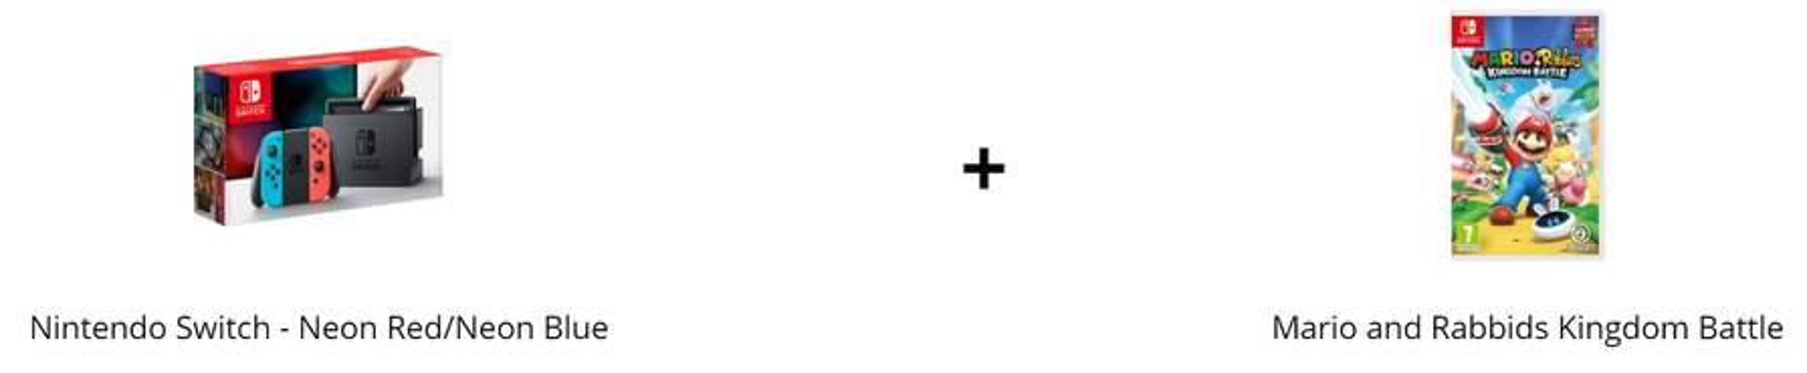 2825338-6feXh.jpg